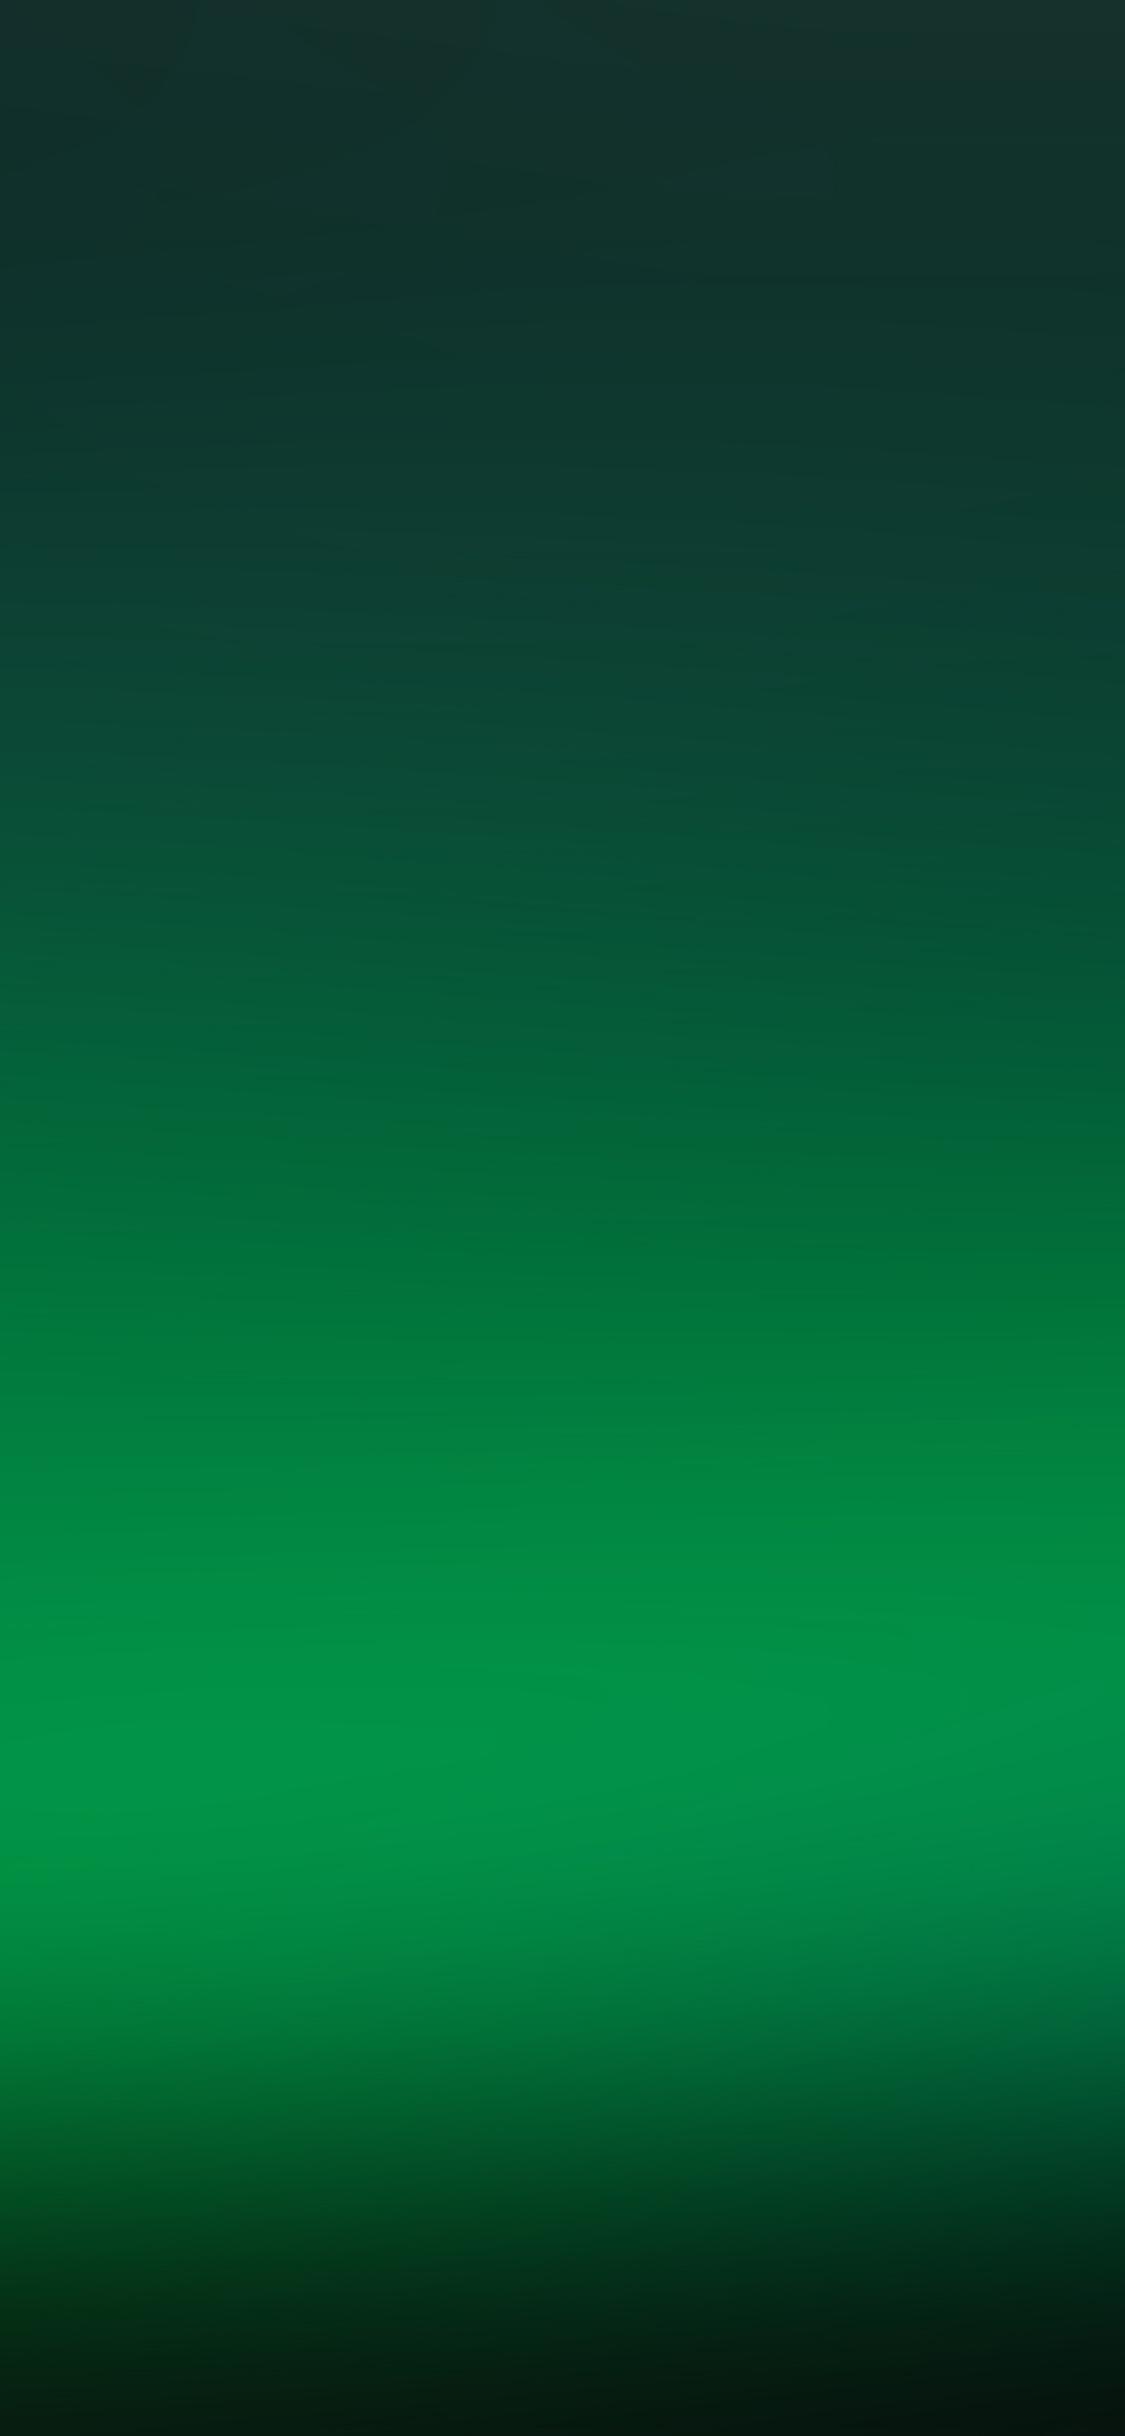 iPhoneXpapers.com-Apple-iPhone-wallpaper-sj22-clear-green-soft-glow-gradation-blur